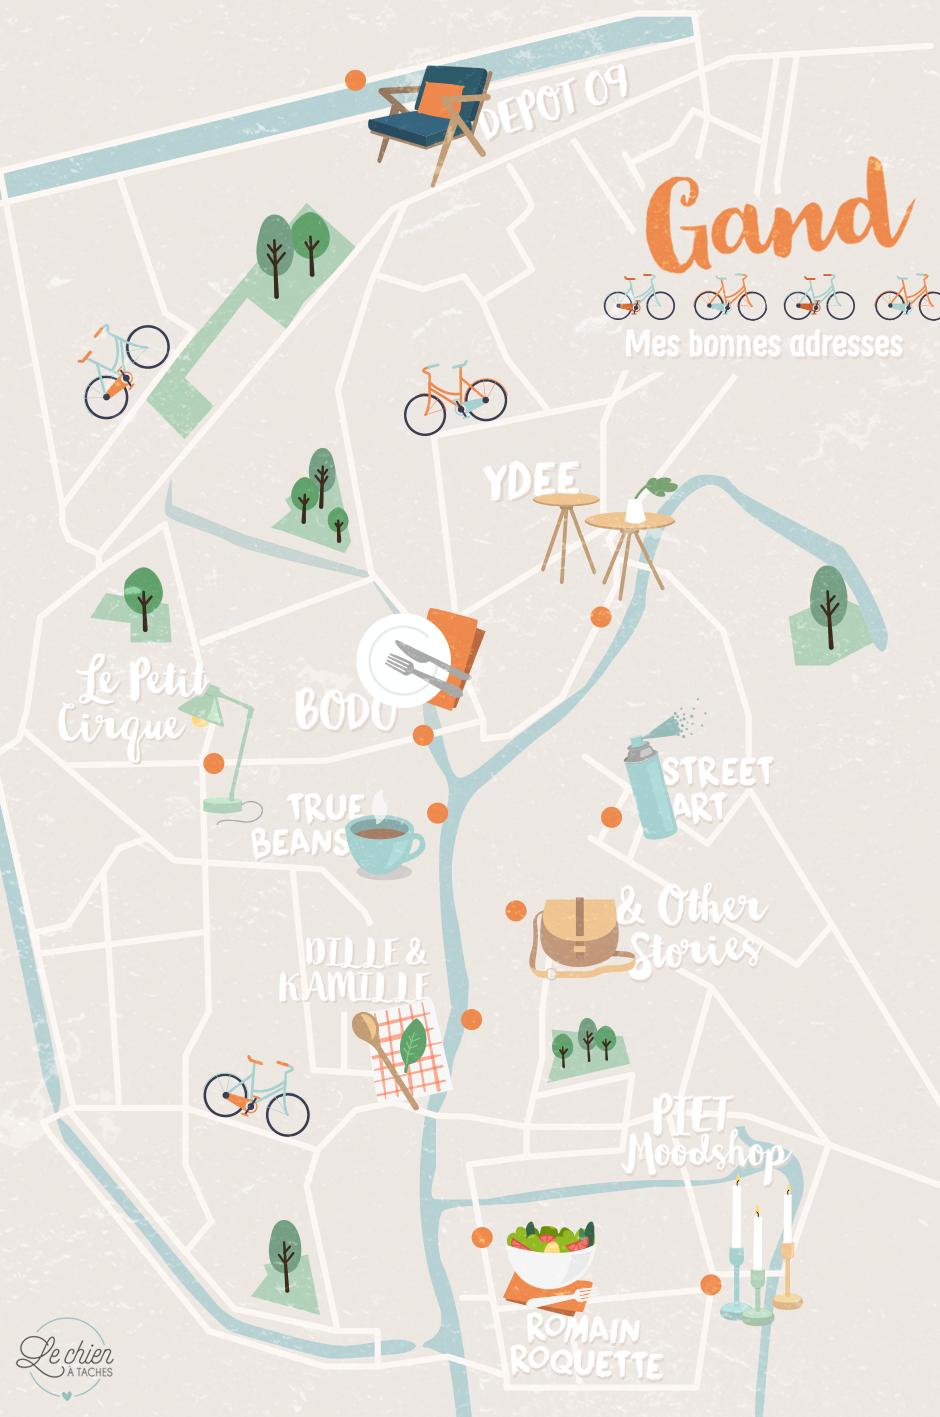 MAPP-Gandok